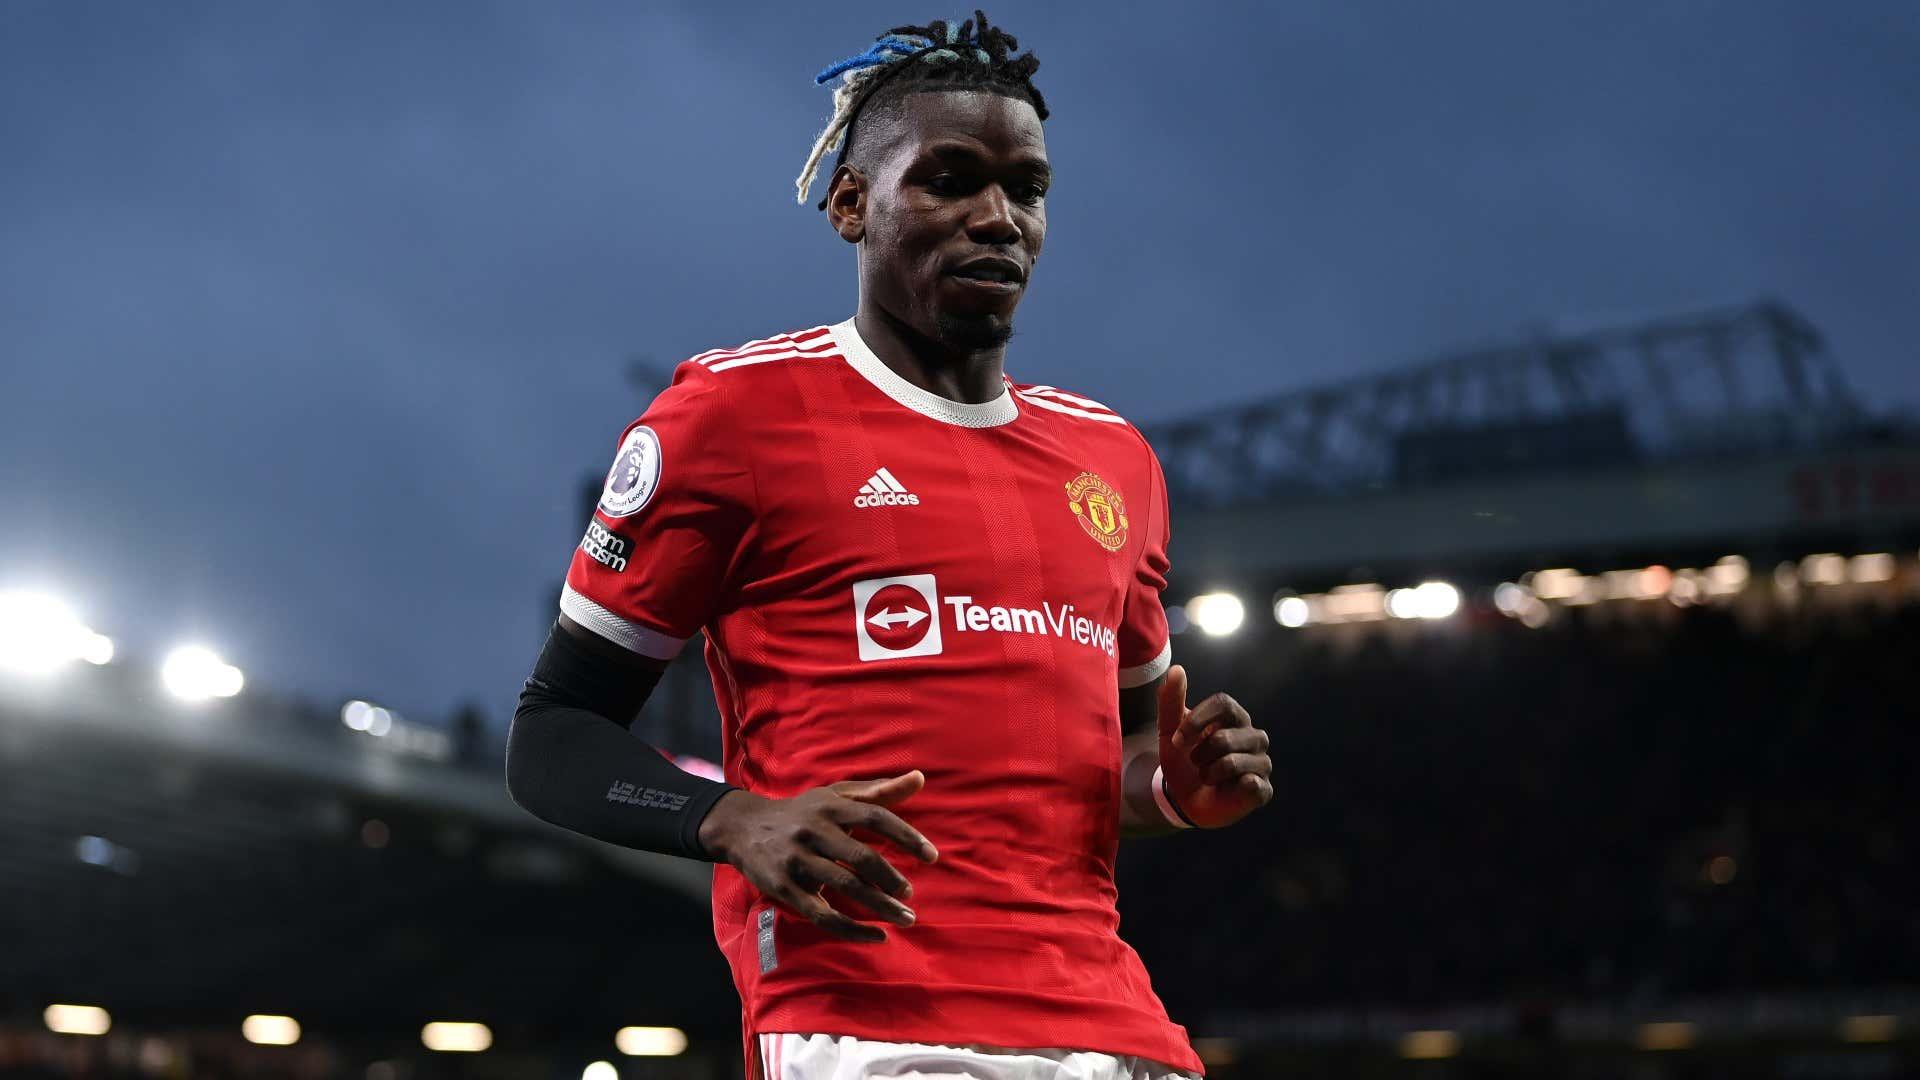 'Big lies' - Pogba denies snubbing Solskjaer and shelving Manchester United contract talks after Liverpool loss | Goal.com